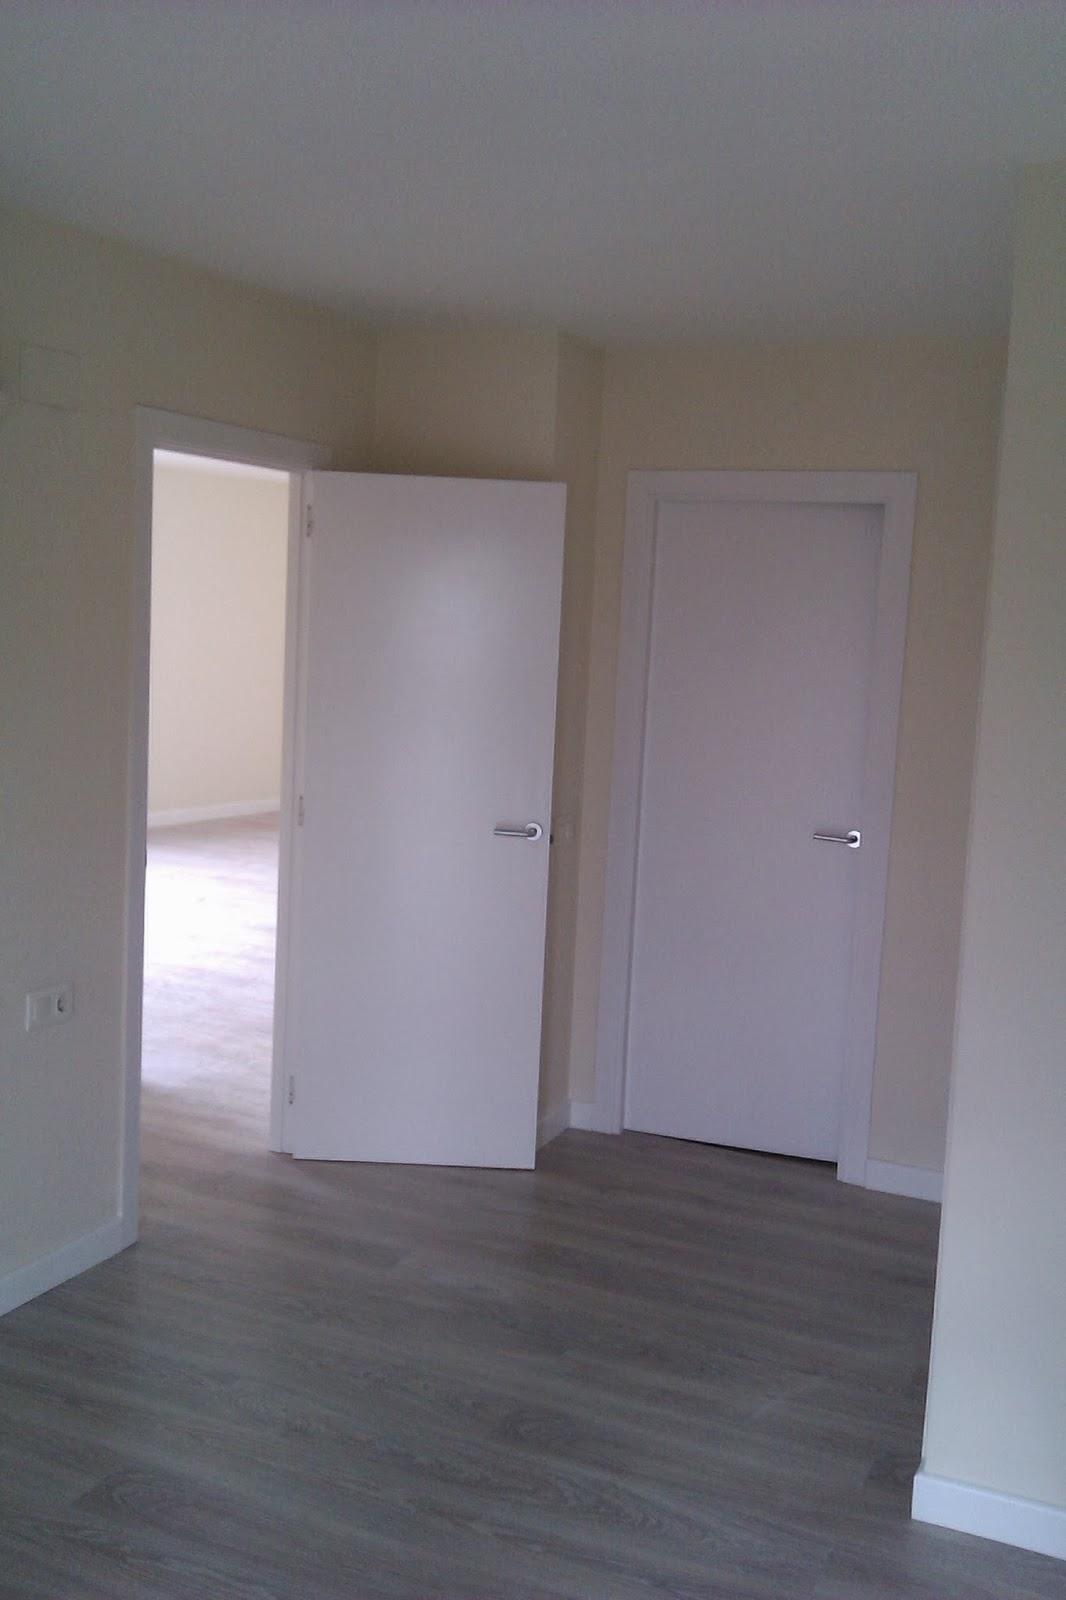 Alquiler de pisos en cobea stunning stunning latest imagen de chalet adosado en calle ajalvir - Pisos de alquiler sabadell baratos ...